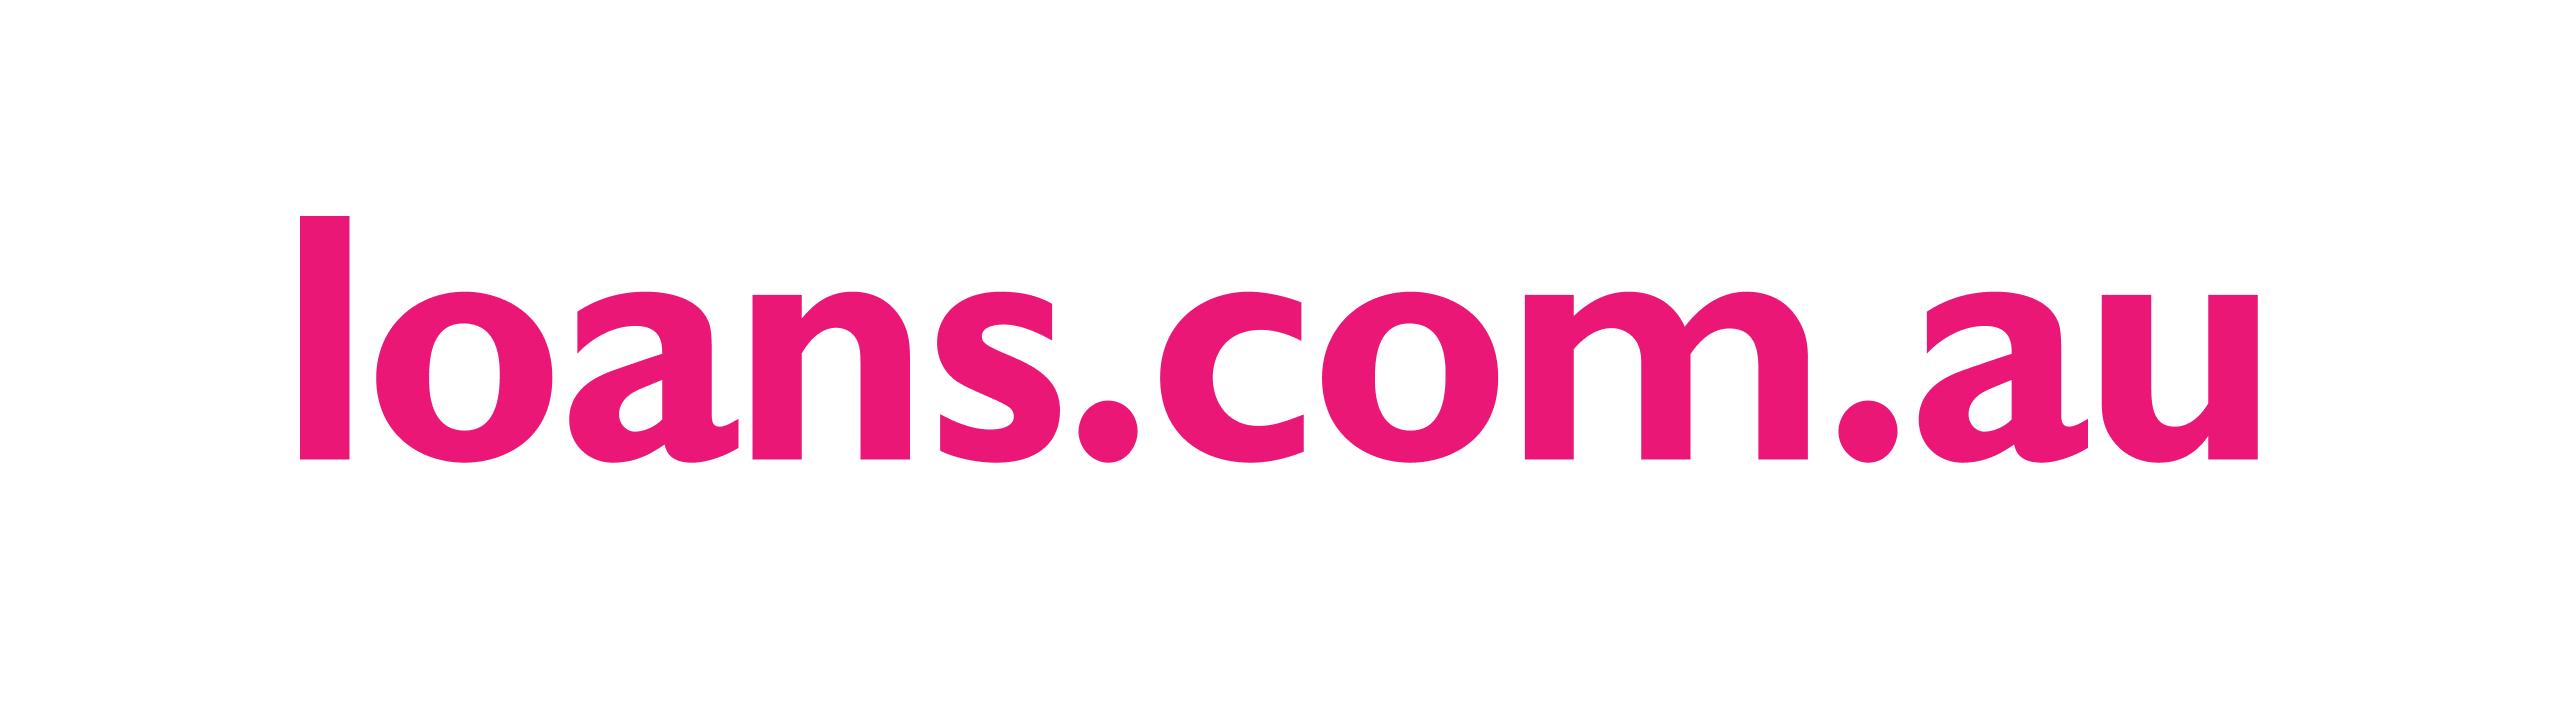 loanscomau logo